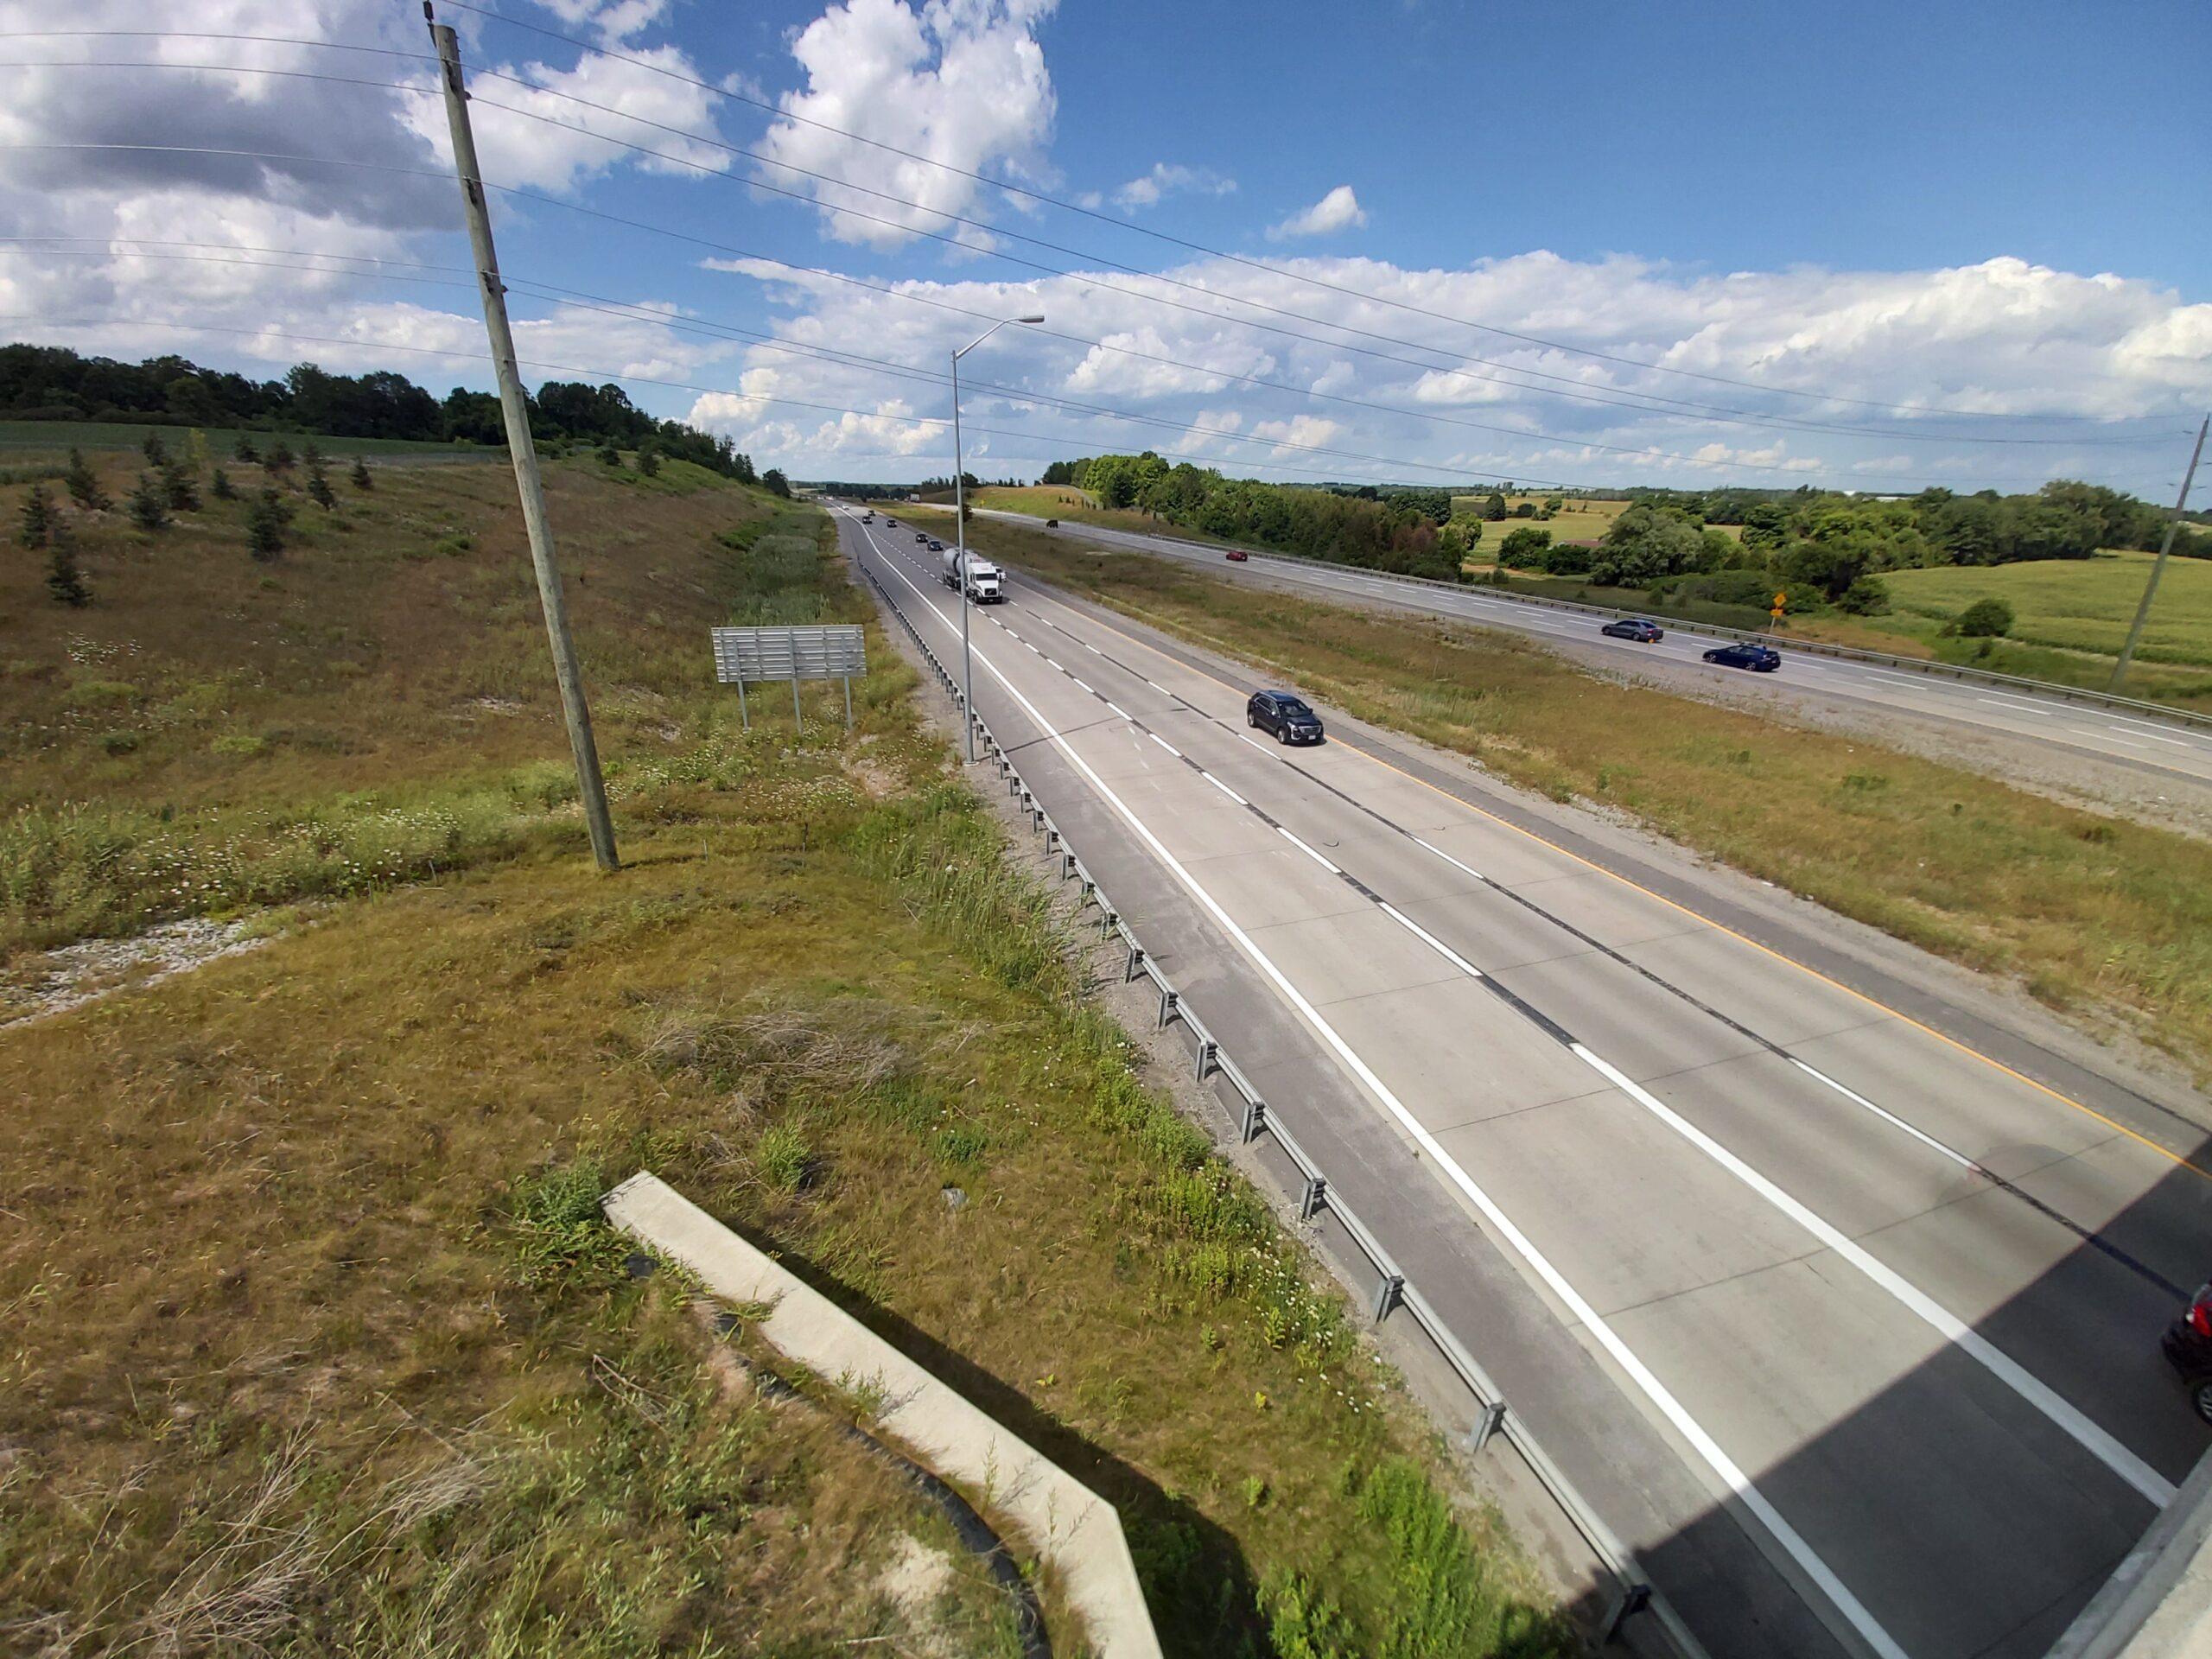 Highway 400 North from the Queensville sideroad bridge.